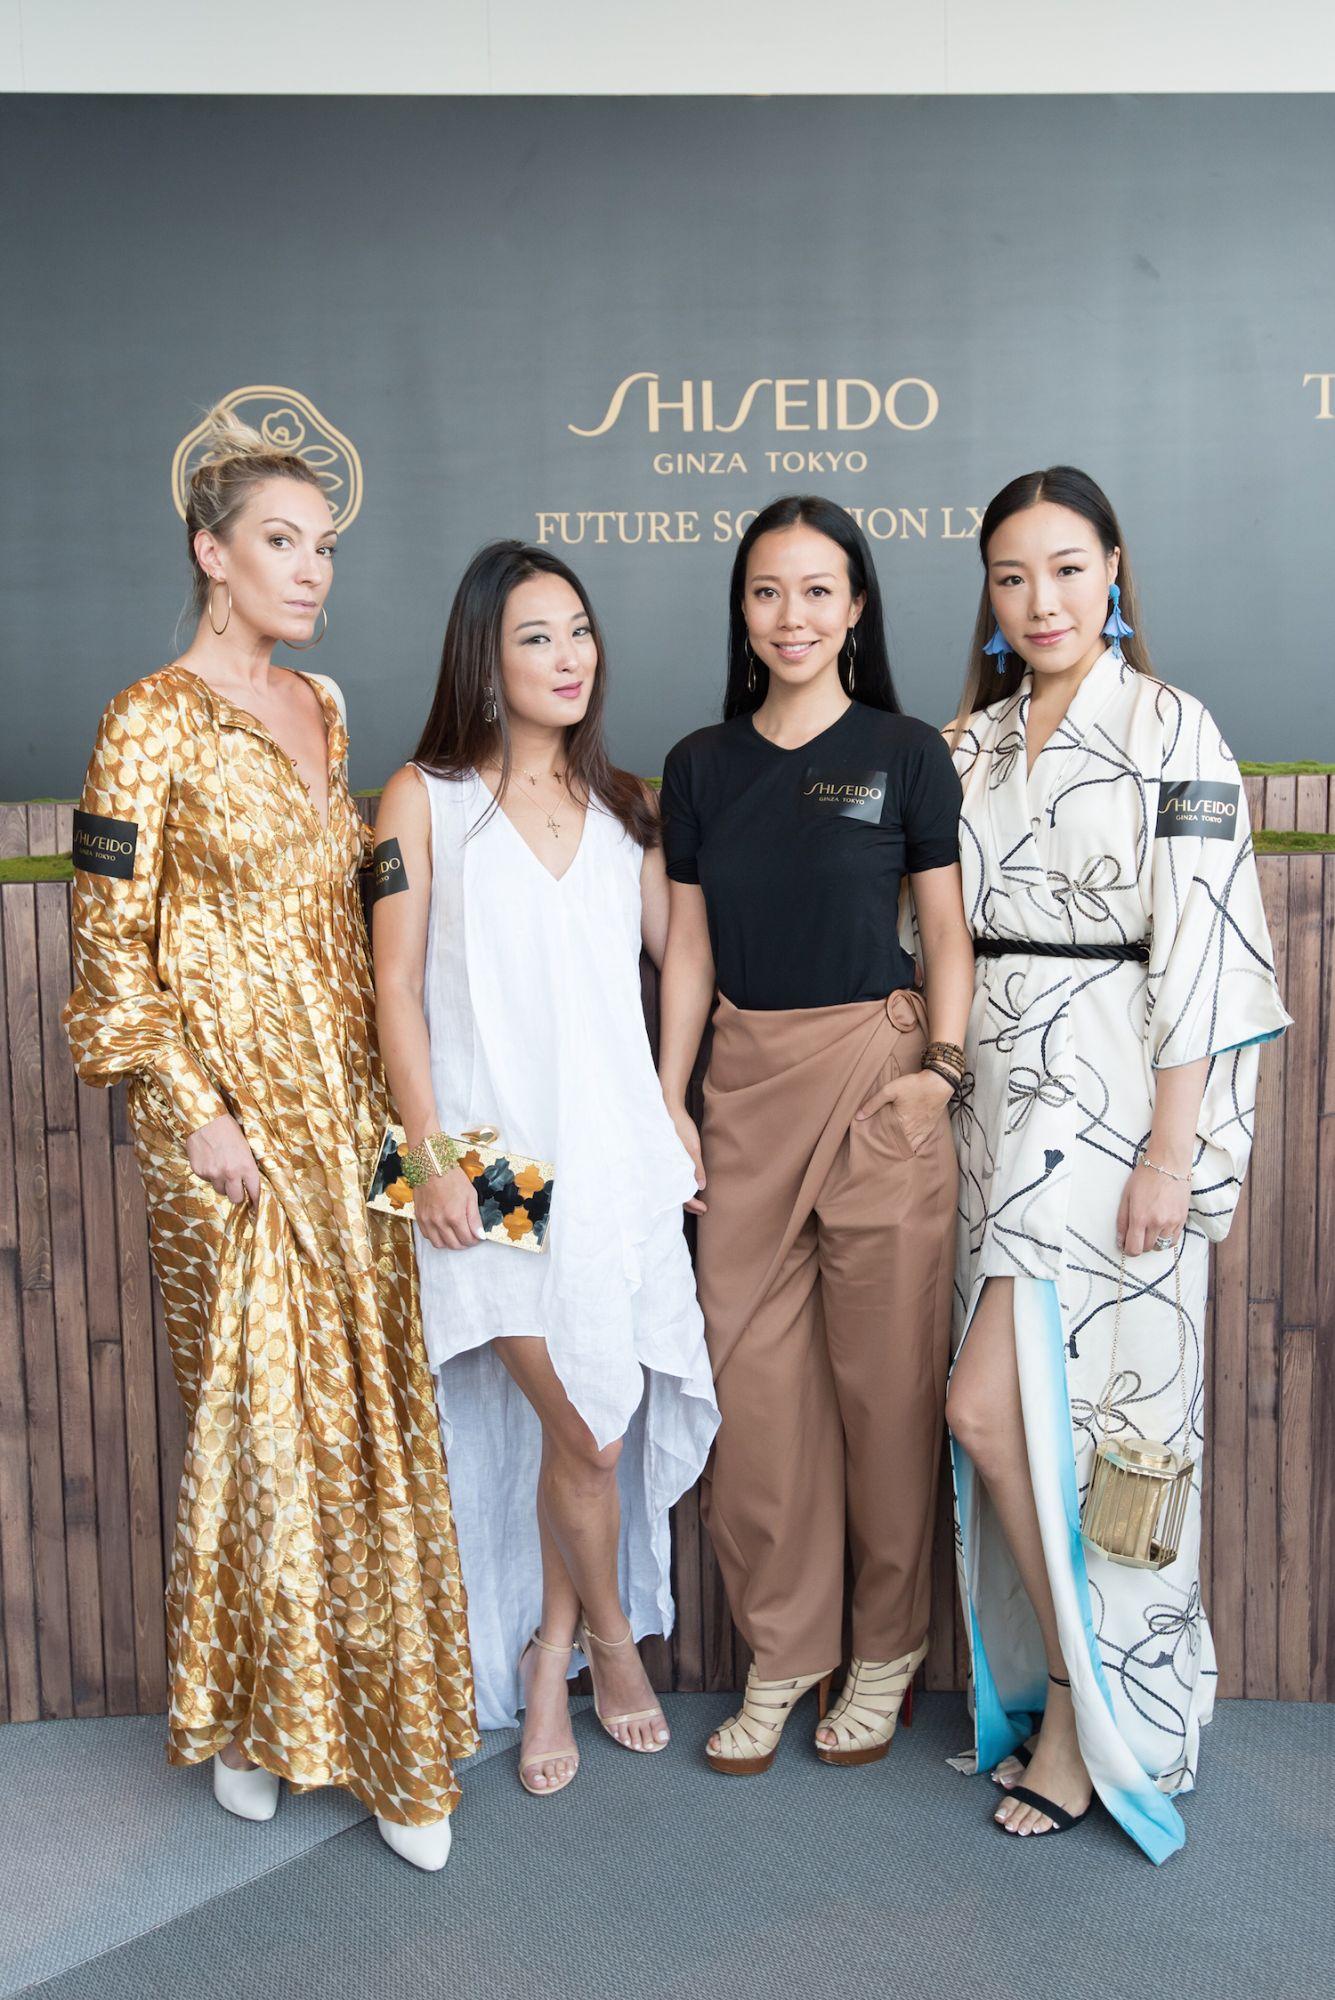 Olivia Croucher Buckingham, Antonia Li, Claudine Ying and Feiping Chang